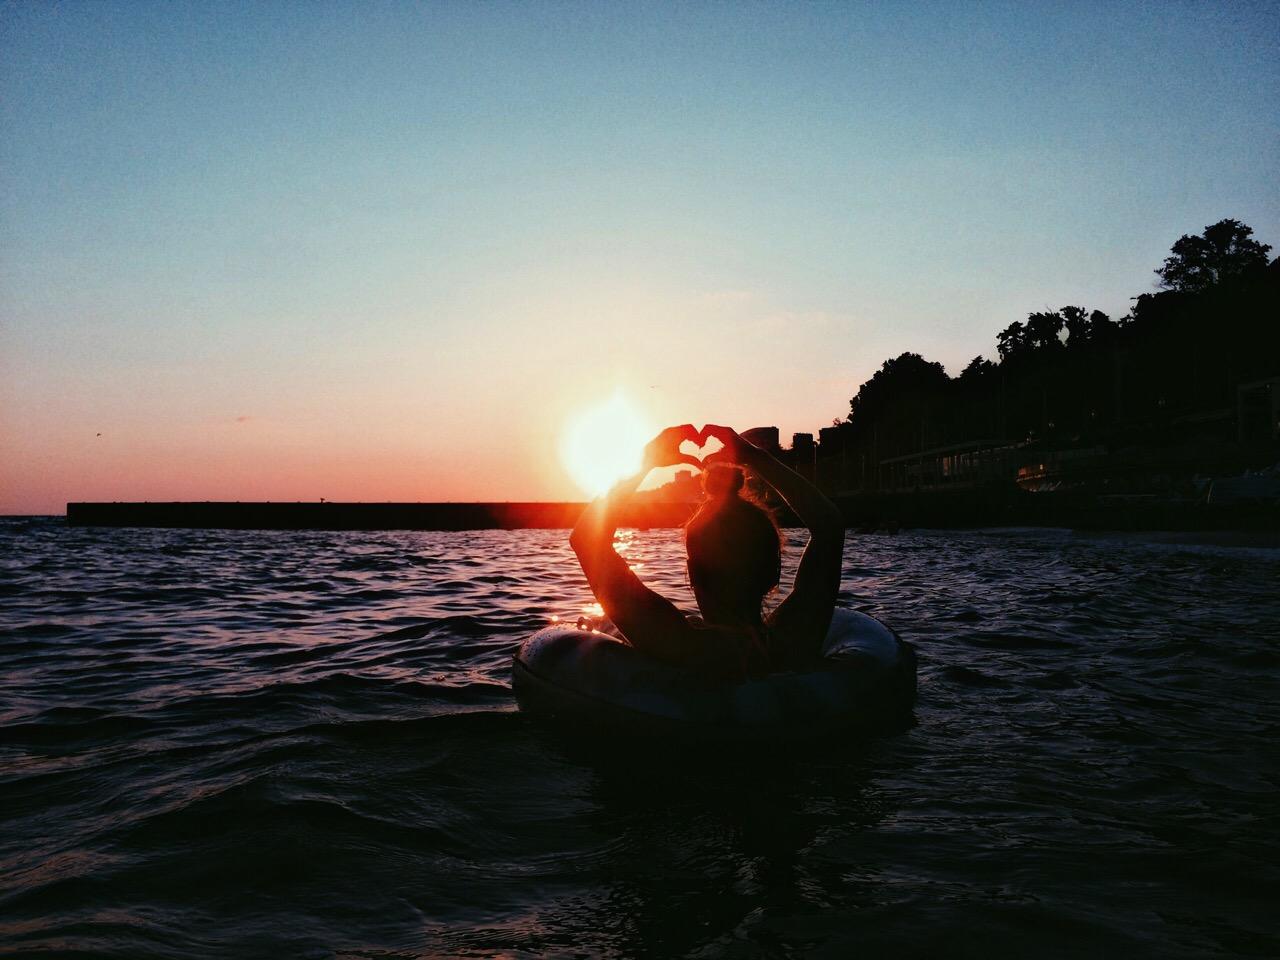 Ловлю закат... сердцем.:)